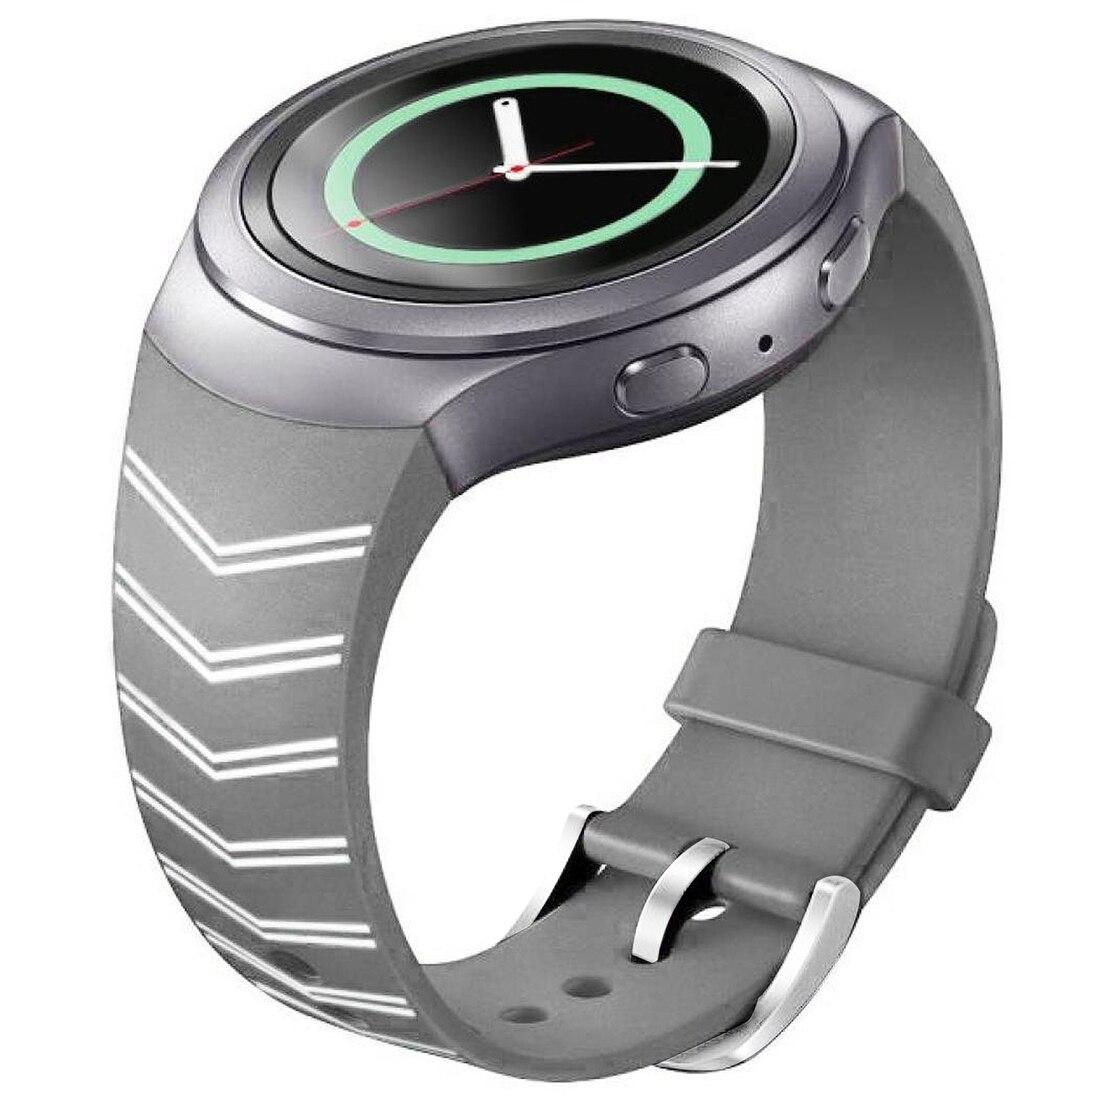 Luxury Silicone Watch Band Strap for Samsung Galaxy S2 Gear SM-R720